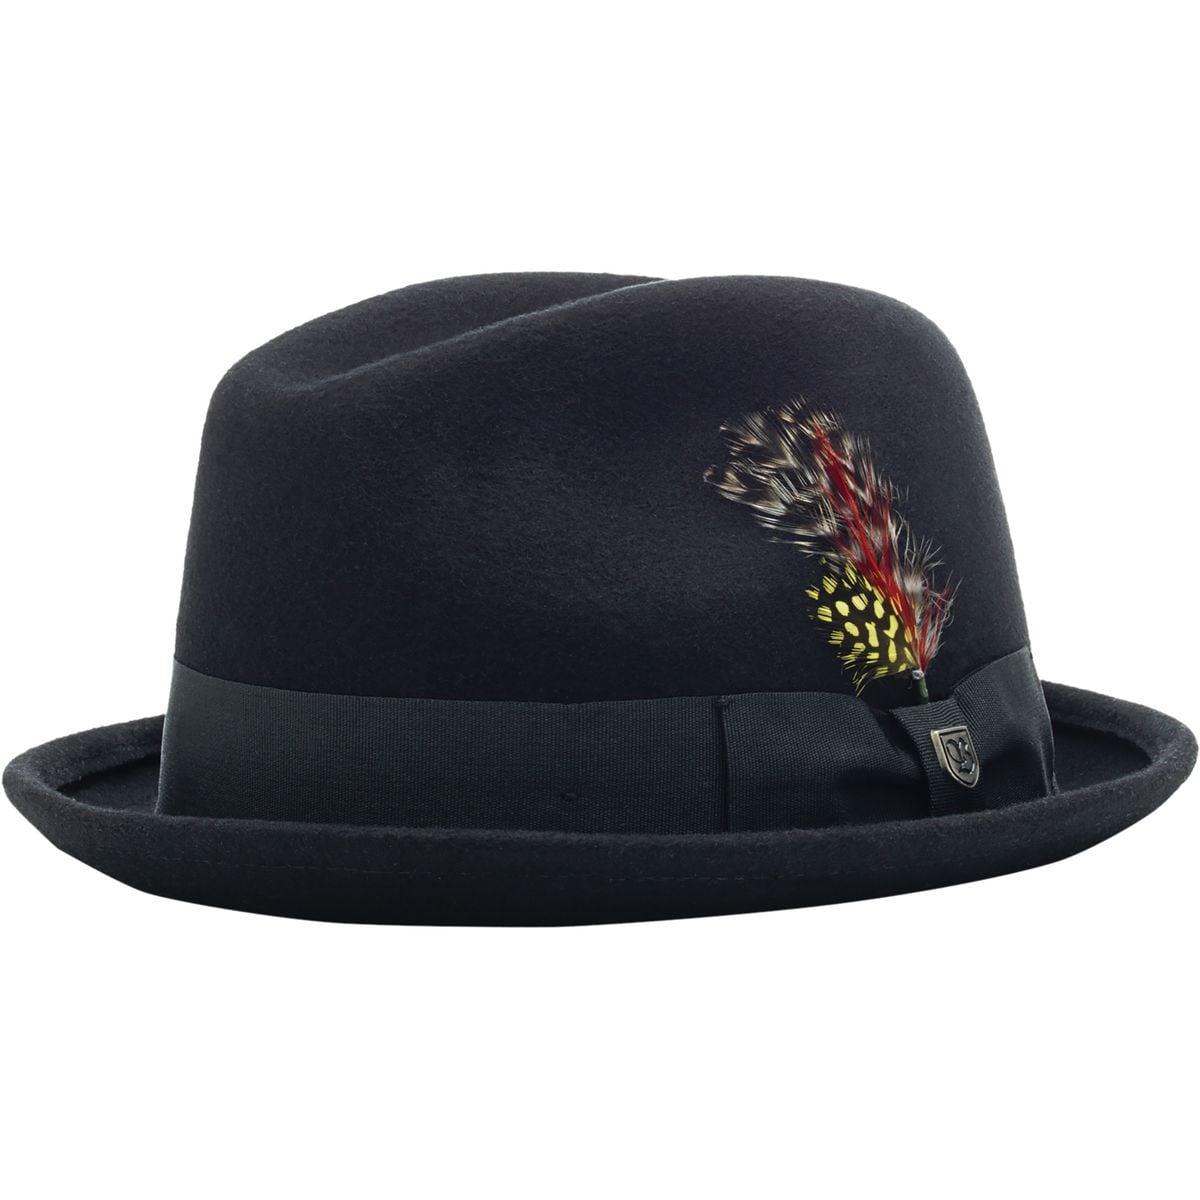 82f09533a5509 ... coupon for brixton mens fedoras gain fedora hat black medium ebay 9af97  1a55a